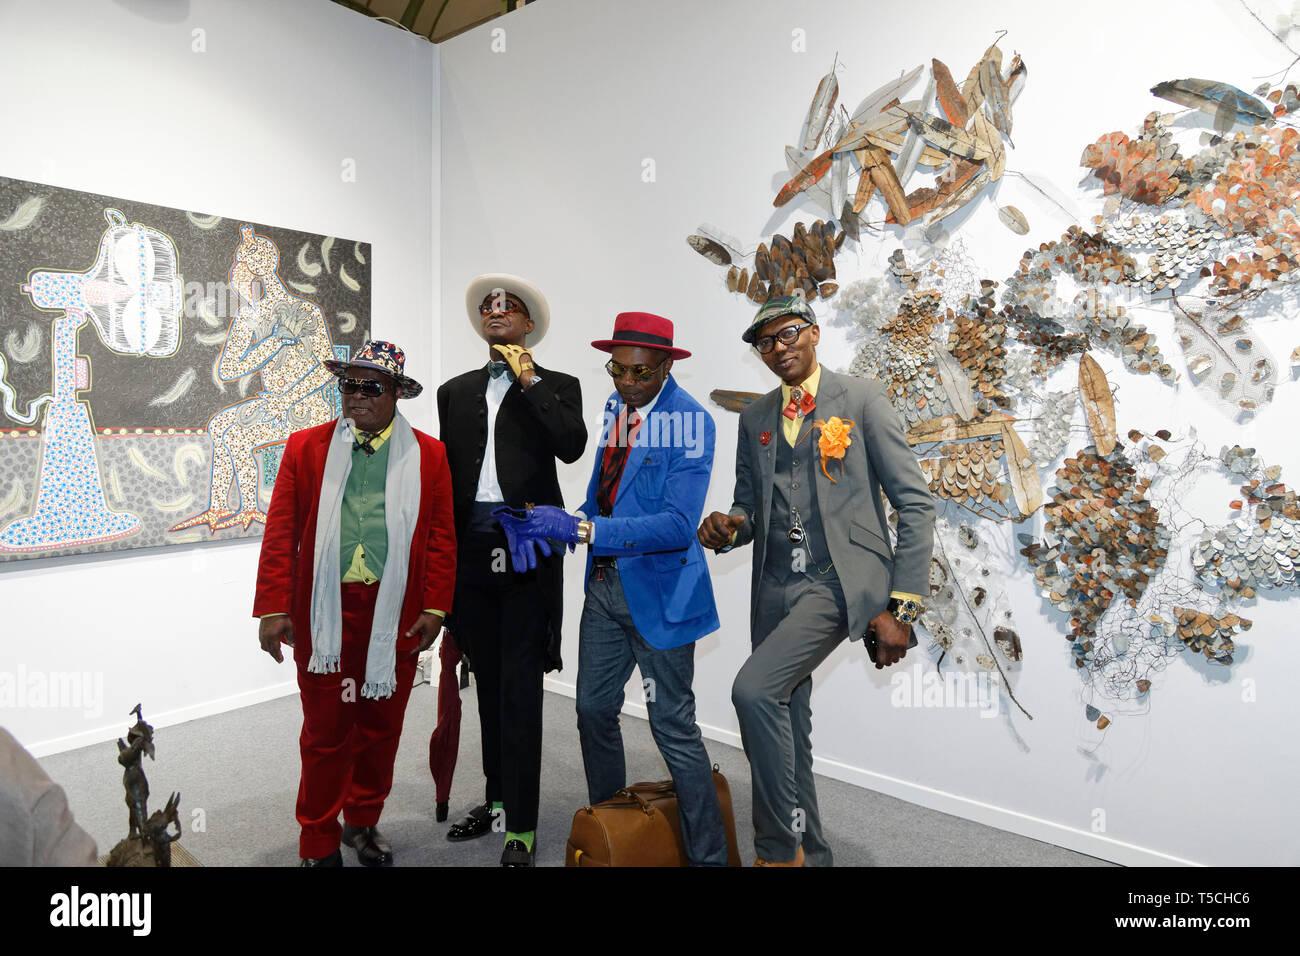 Paris, France. 3th April, 2019. Members of Sapology at Art Fair Art Paris April 3, 2019, France.Credit: Veronique Phitoussi/Alamy Stock Photo Stock Photo